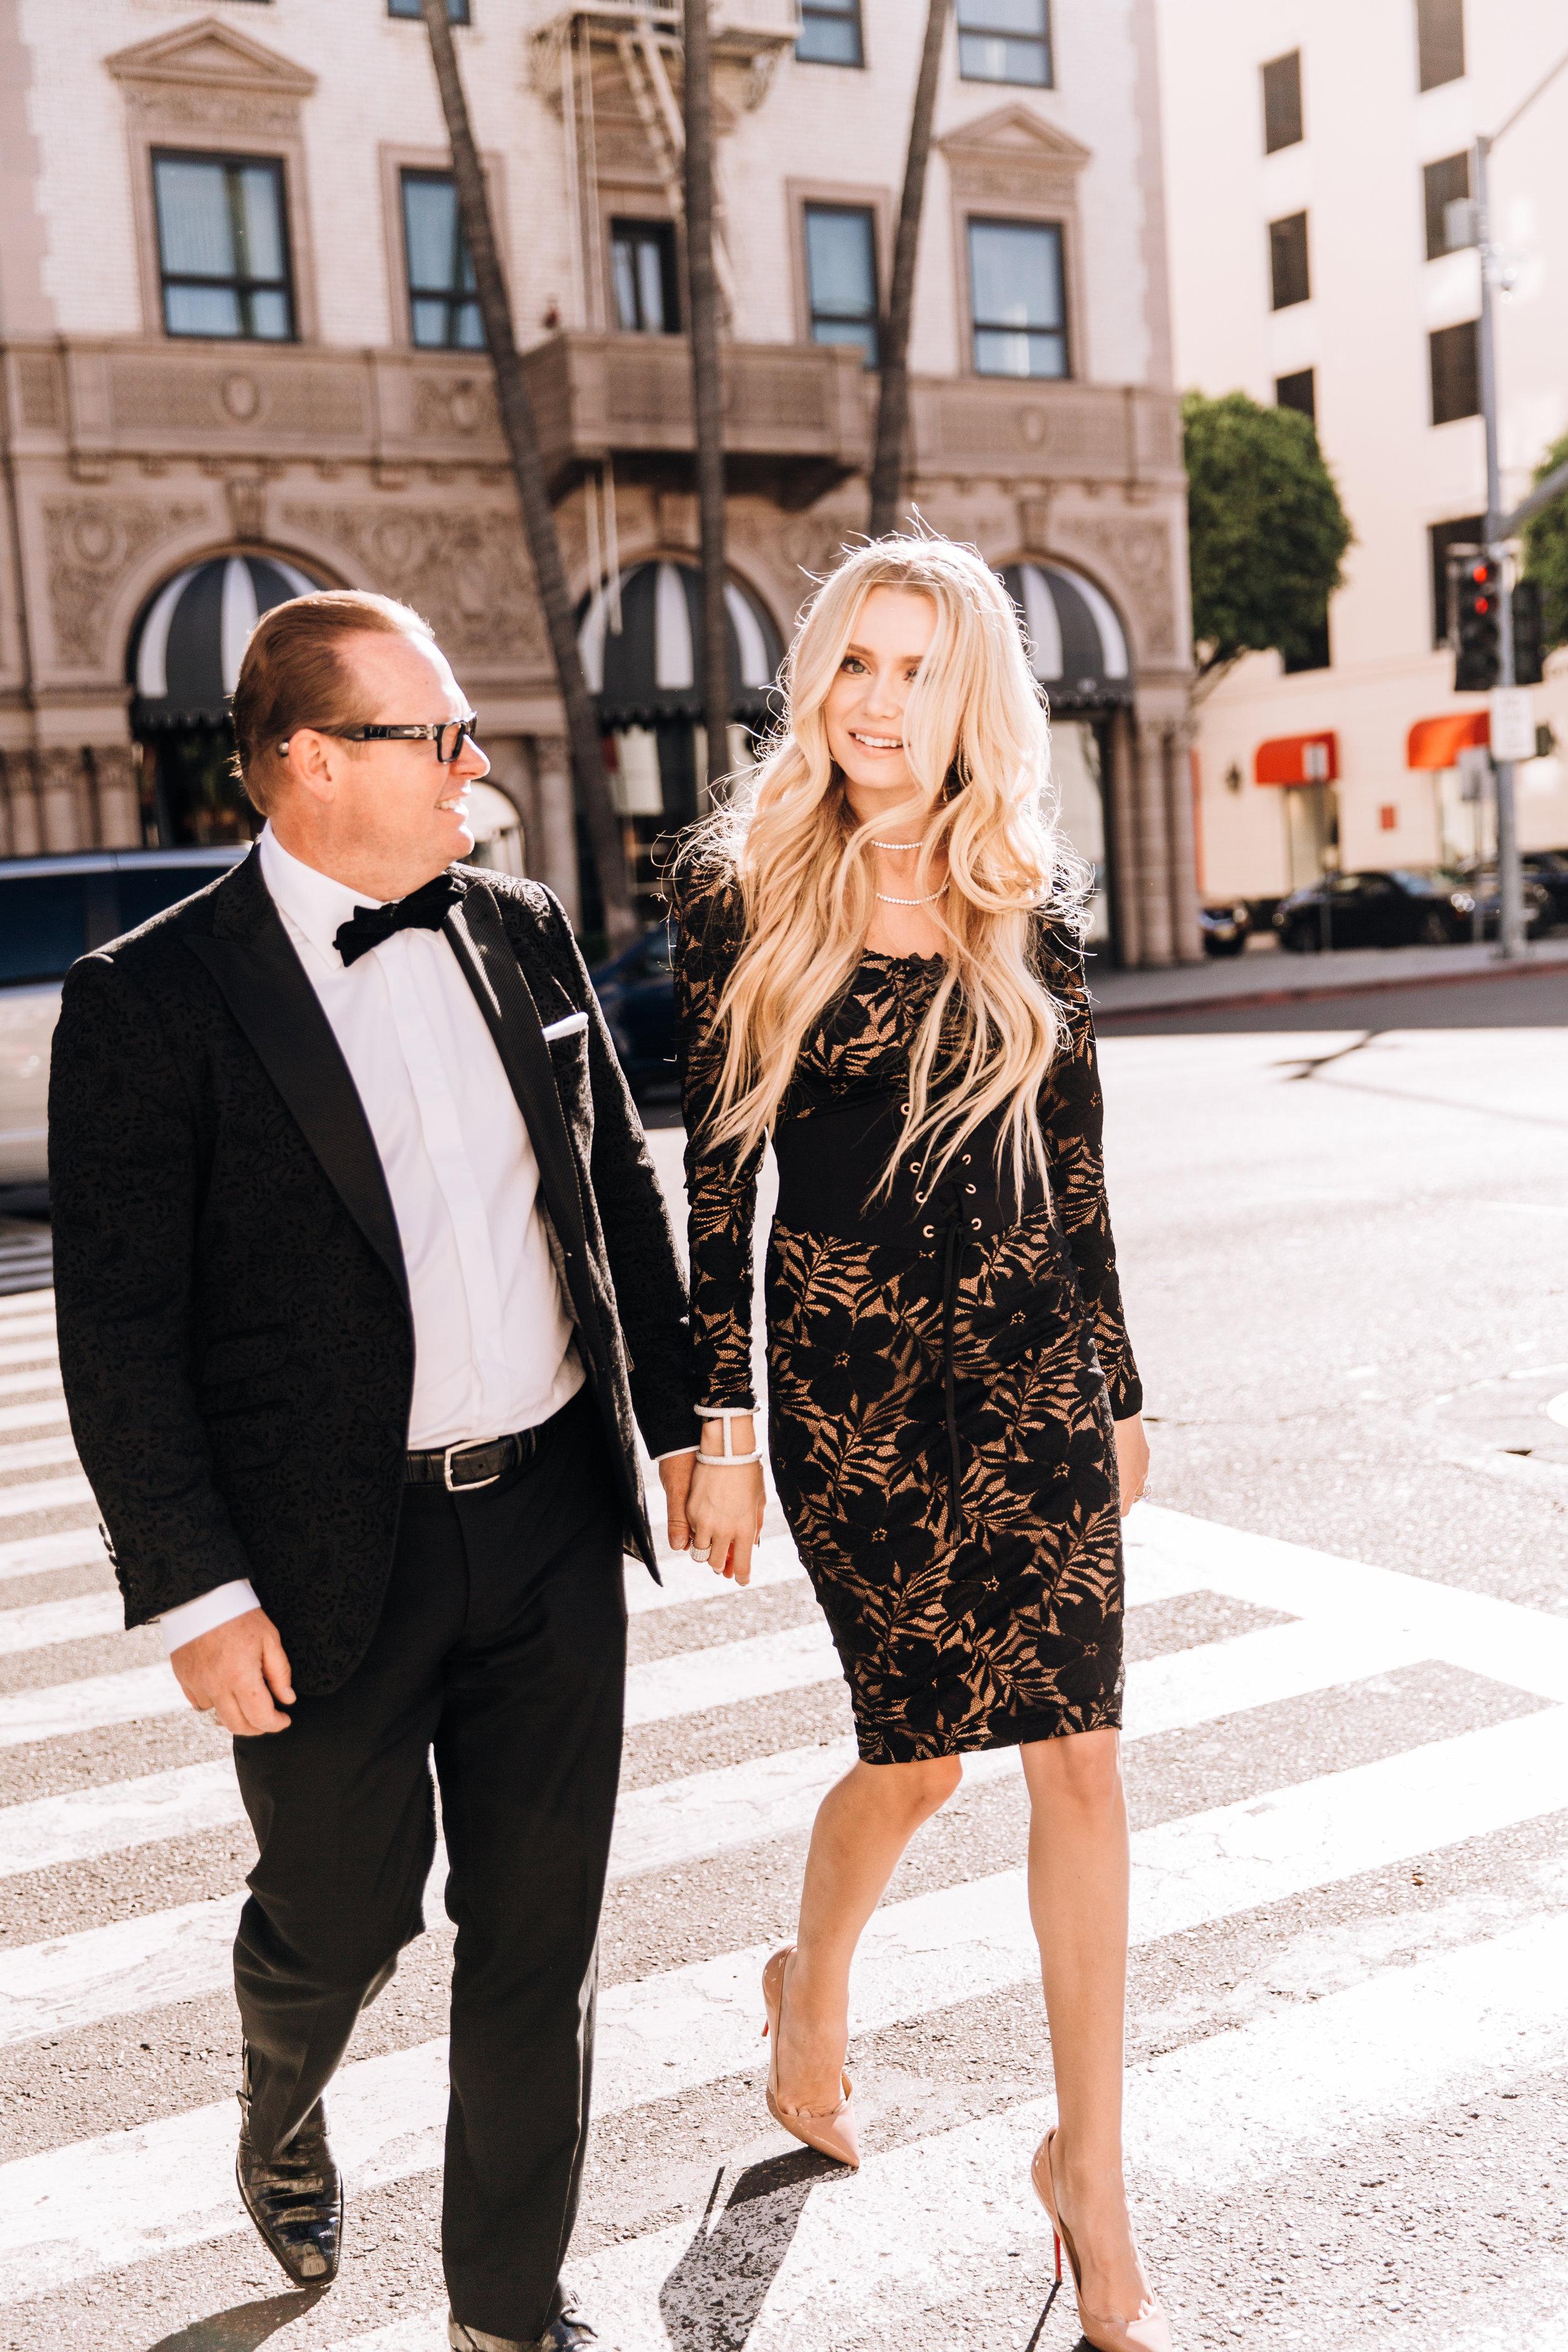 KaraNixonWeddings-BeverlyHills-RodeoDr-Engagement-16.jpg